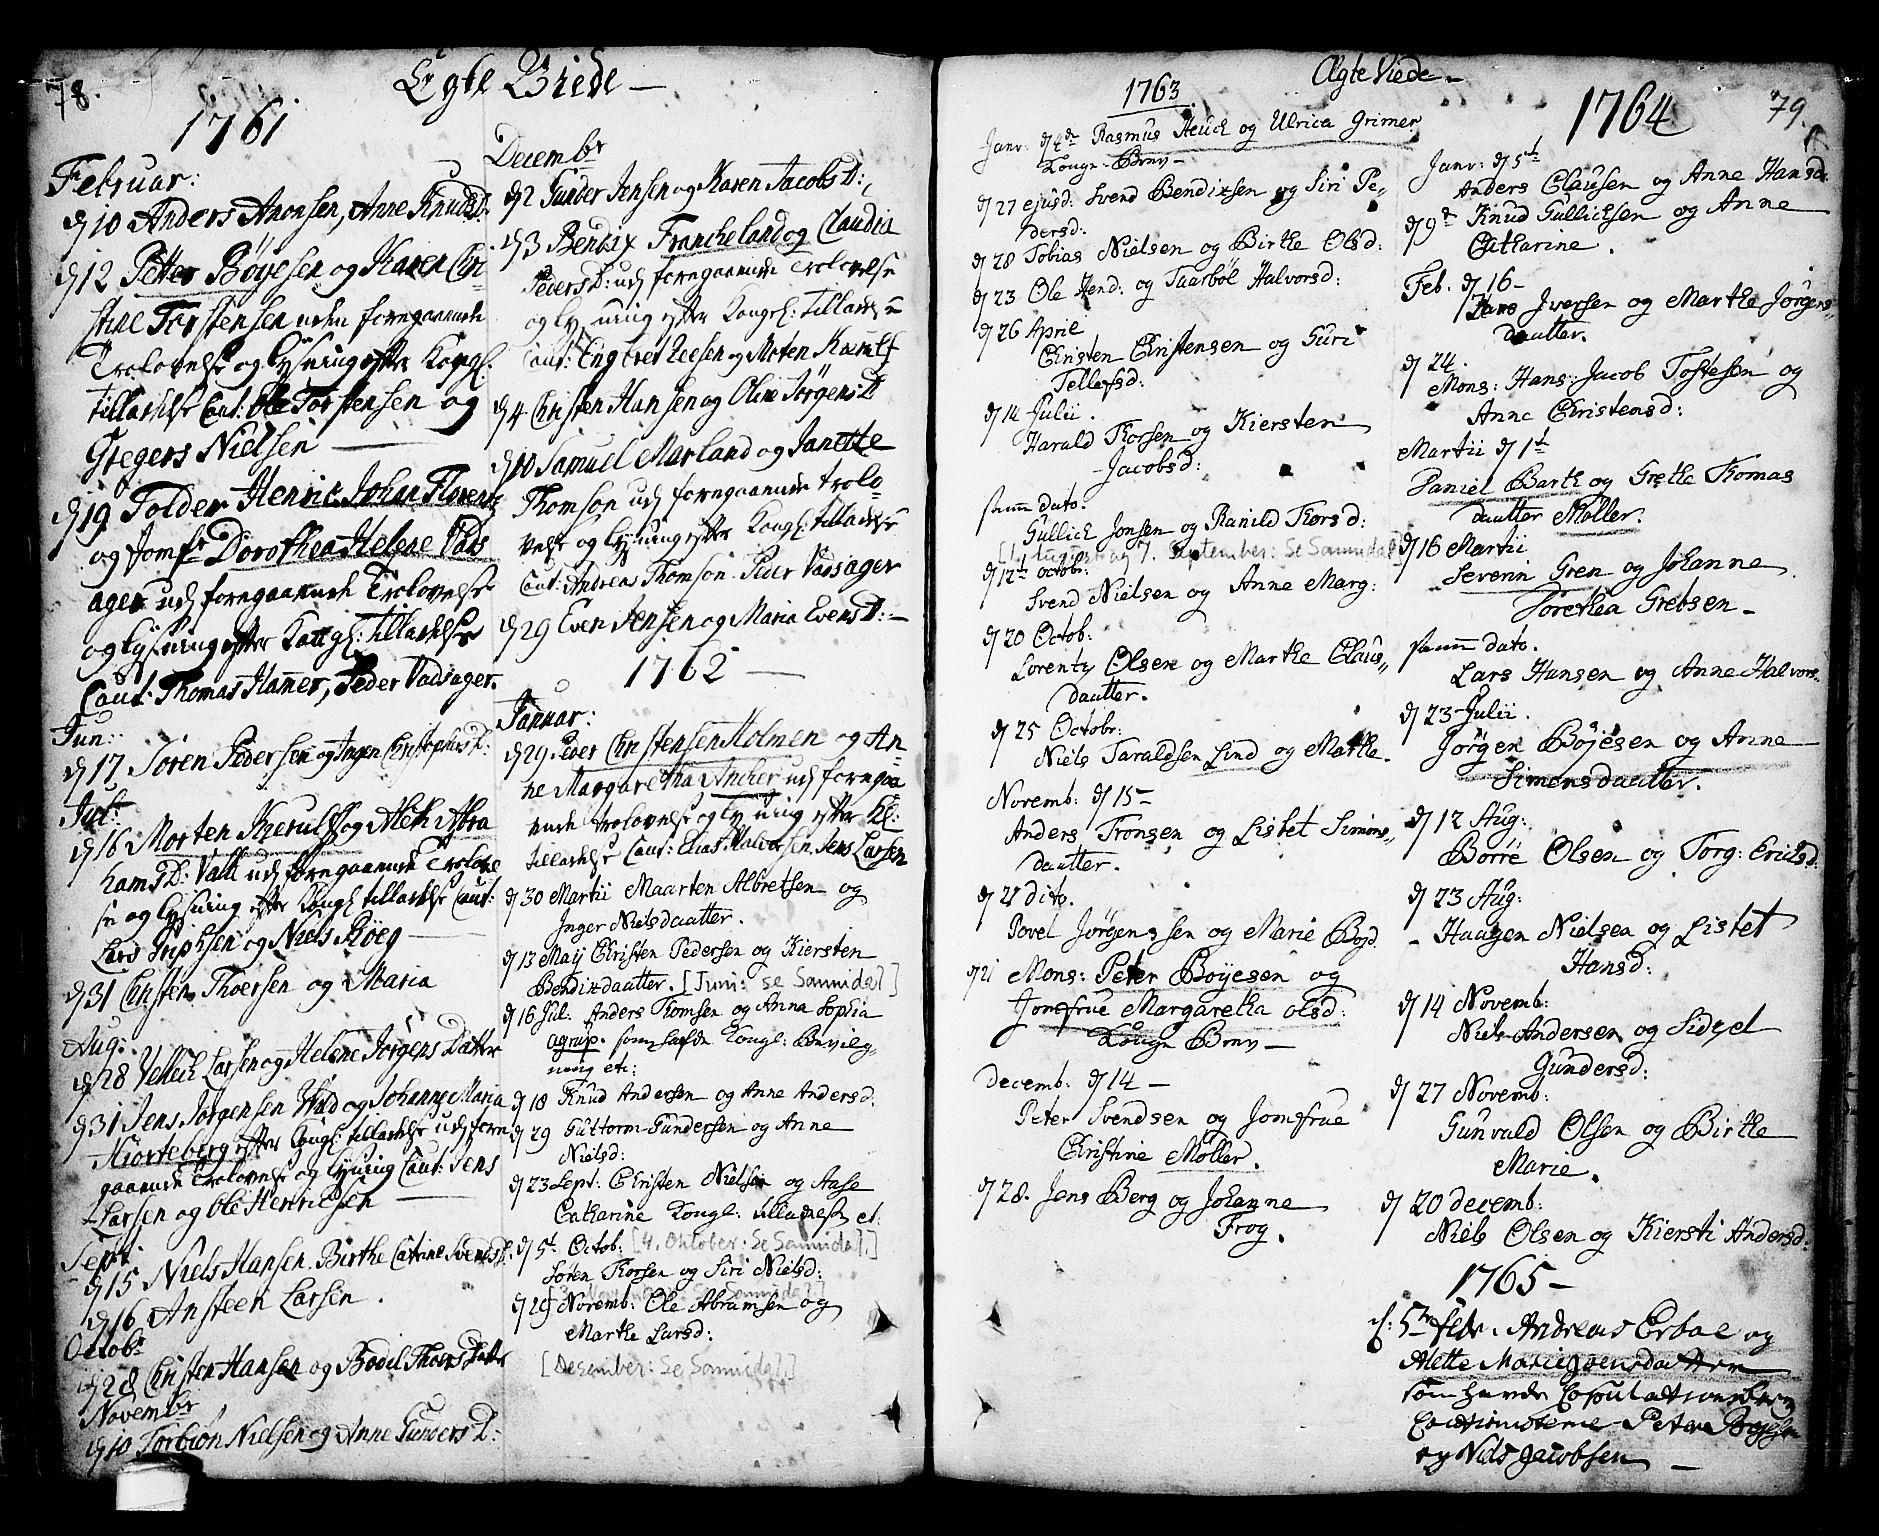 SAKO, Kragerø kirkebøker, F/Fa/L0001: Ministerialbok nr. 1, 1702-1766, s. 78-79